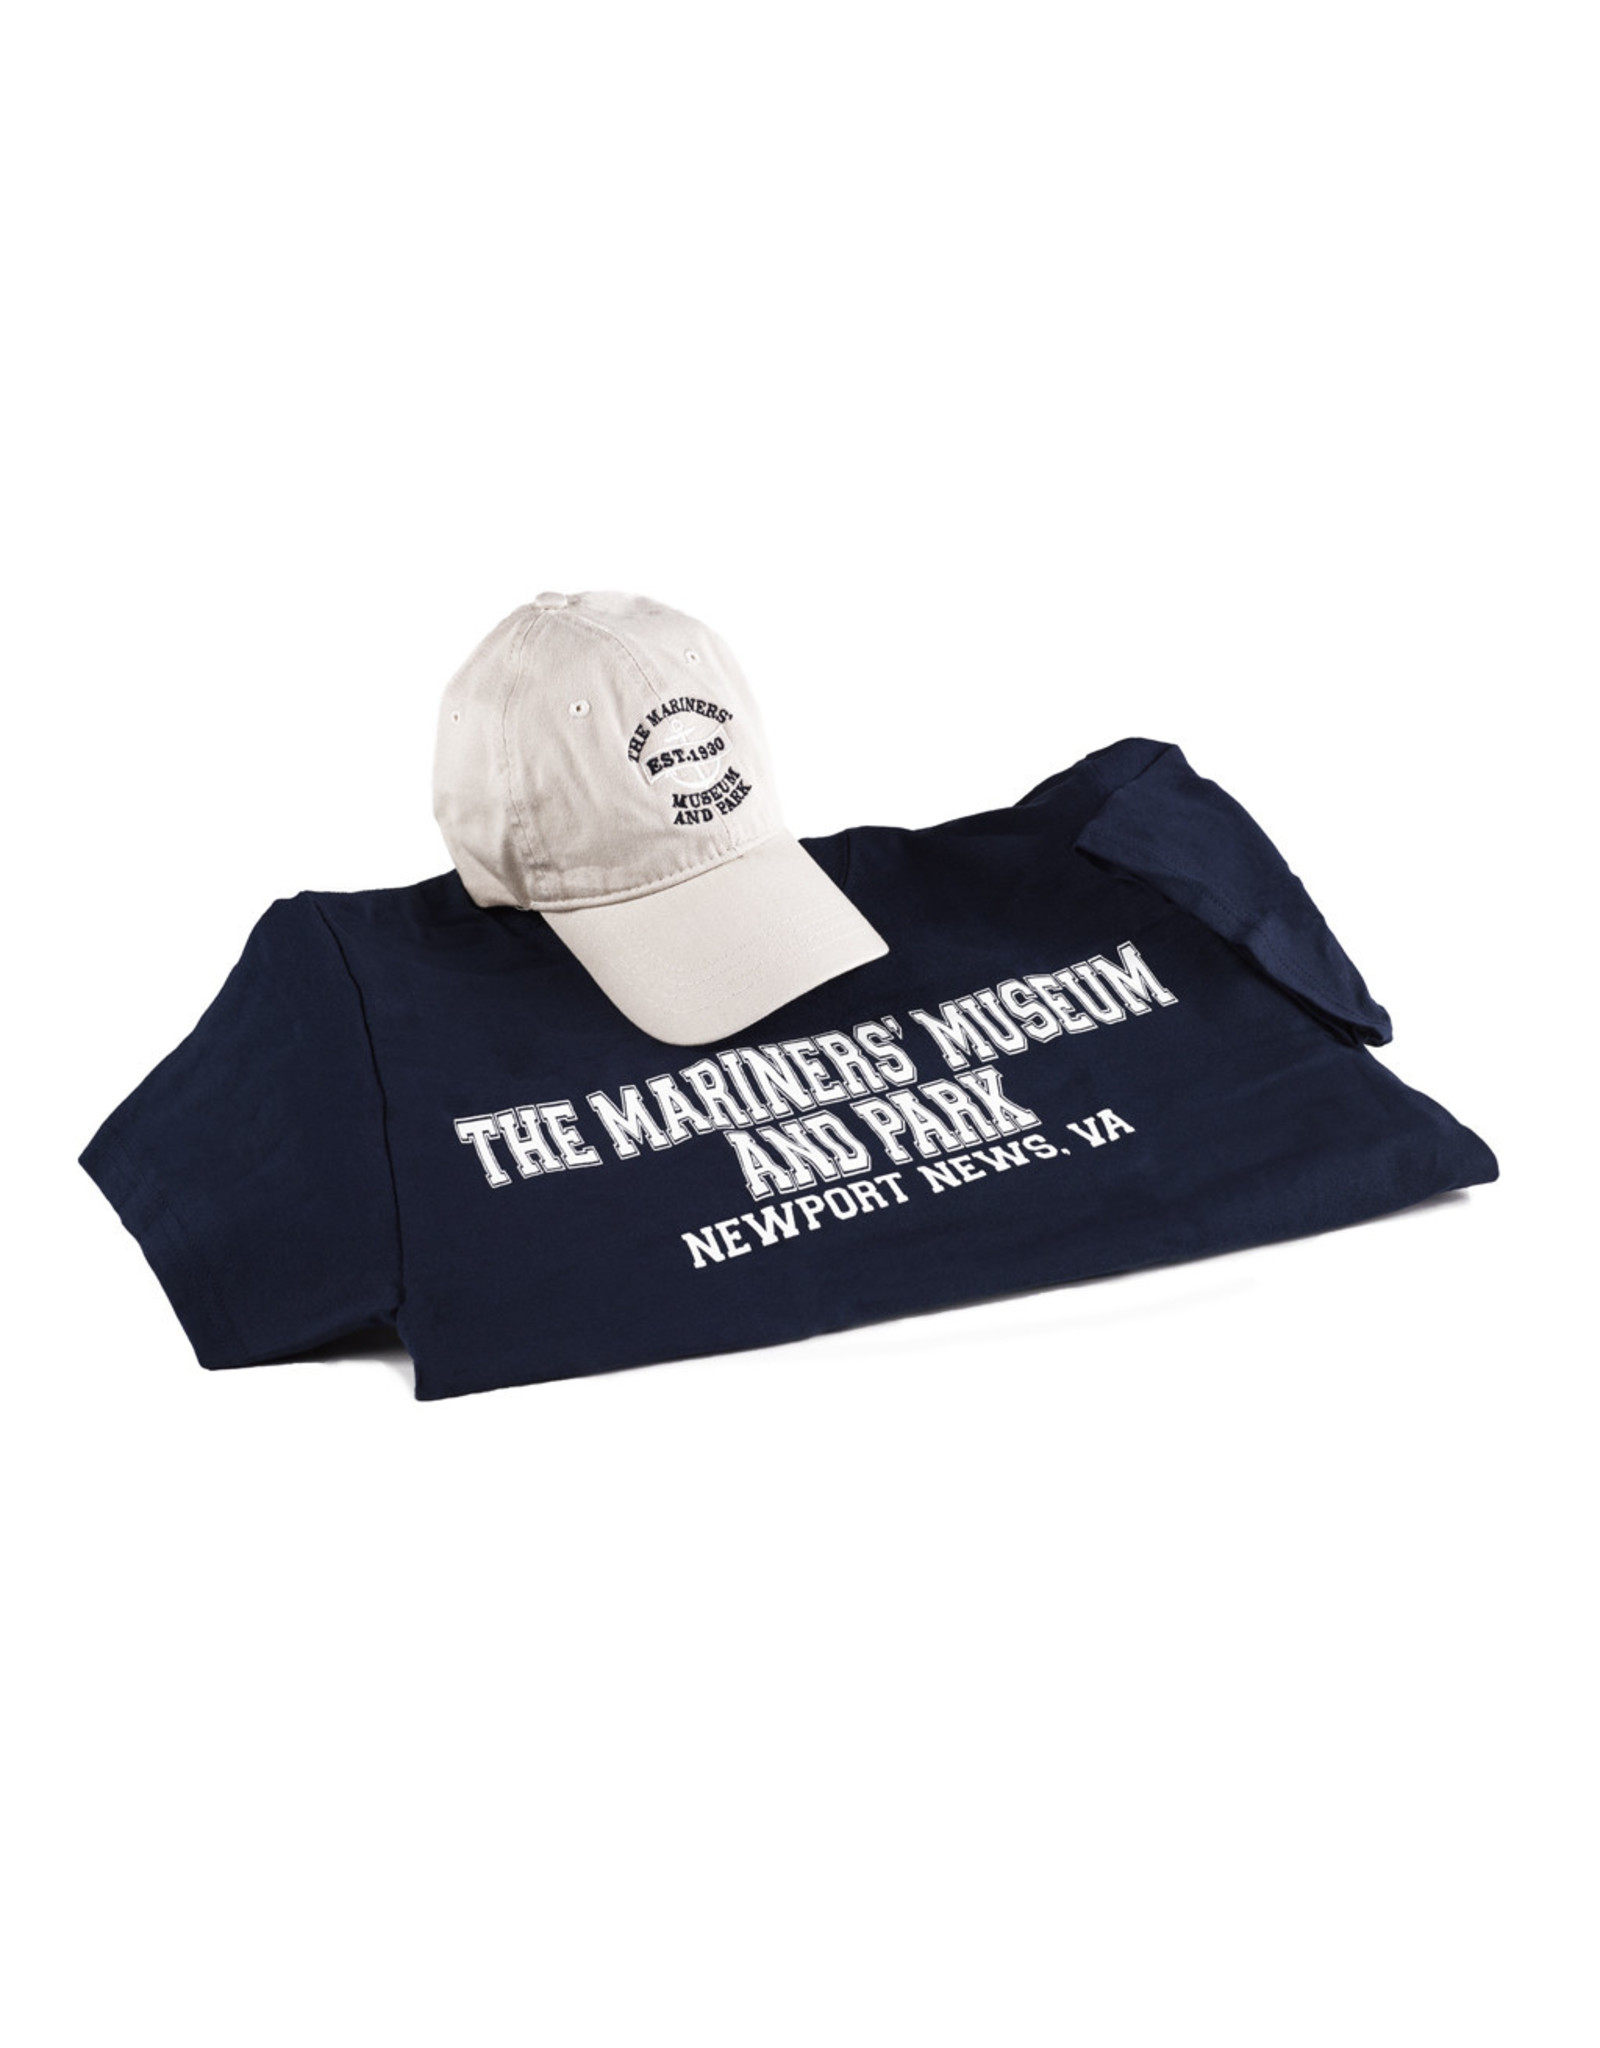 Cap & T-Shirt Combo